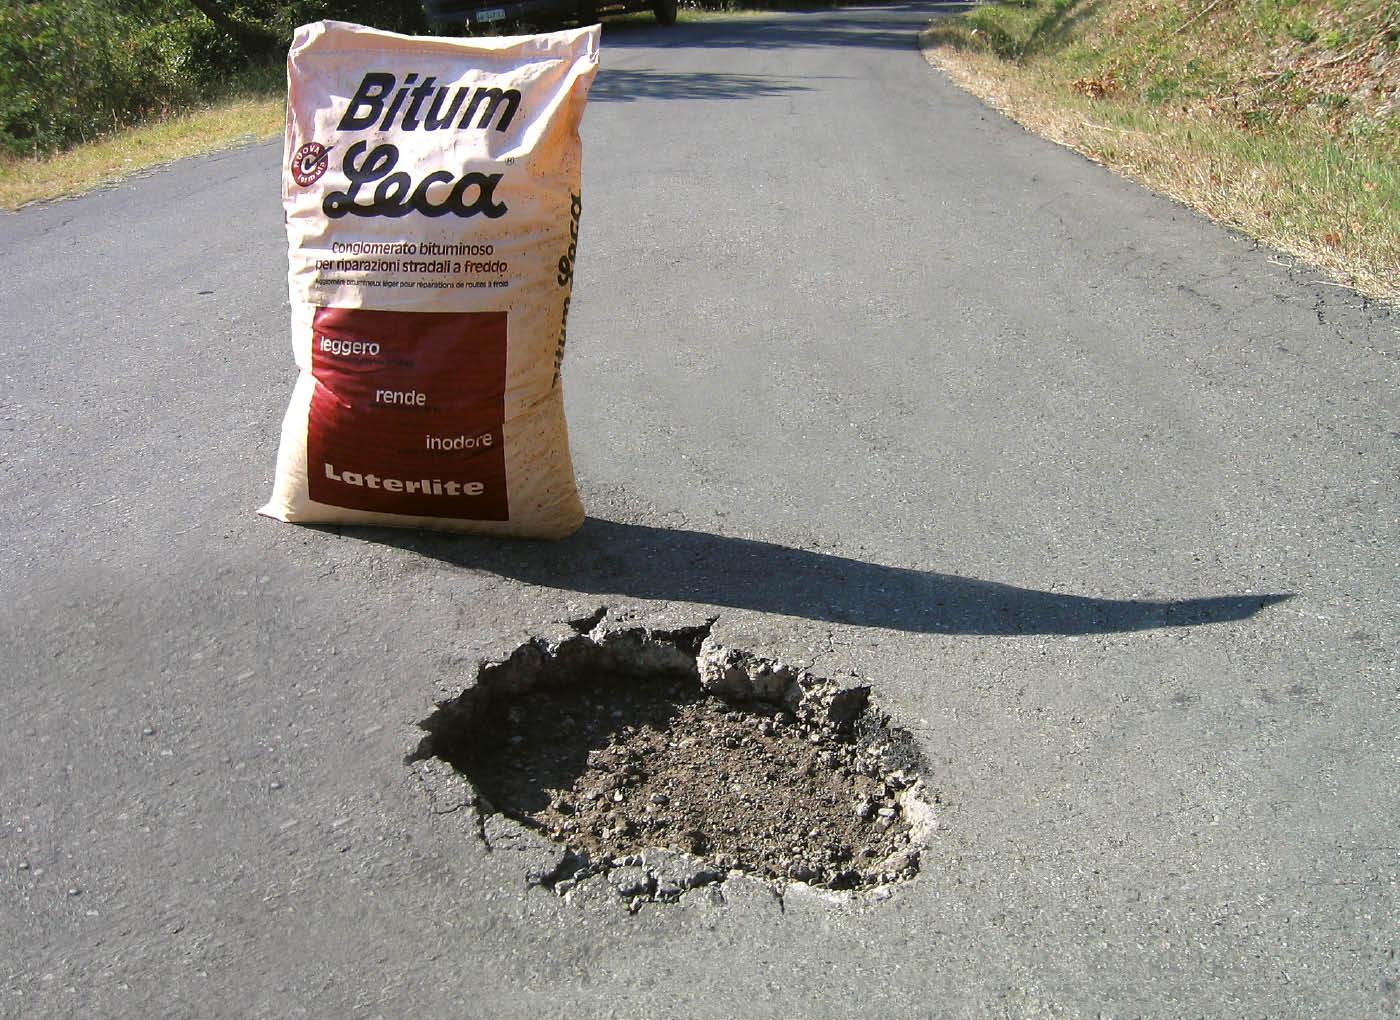 sacco-bitumleca-riparazioni-stradali-P52-2